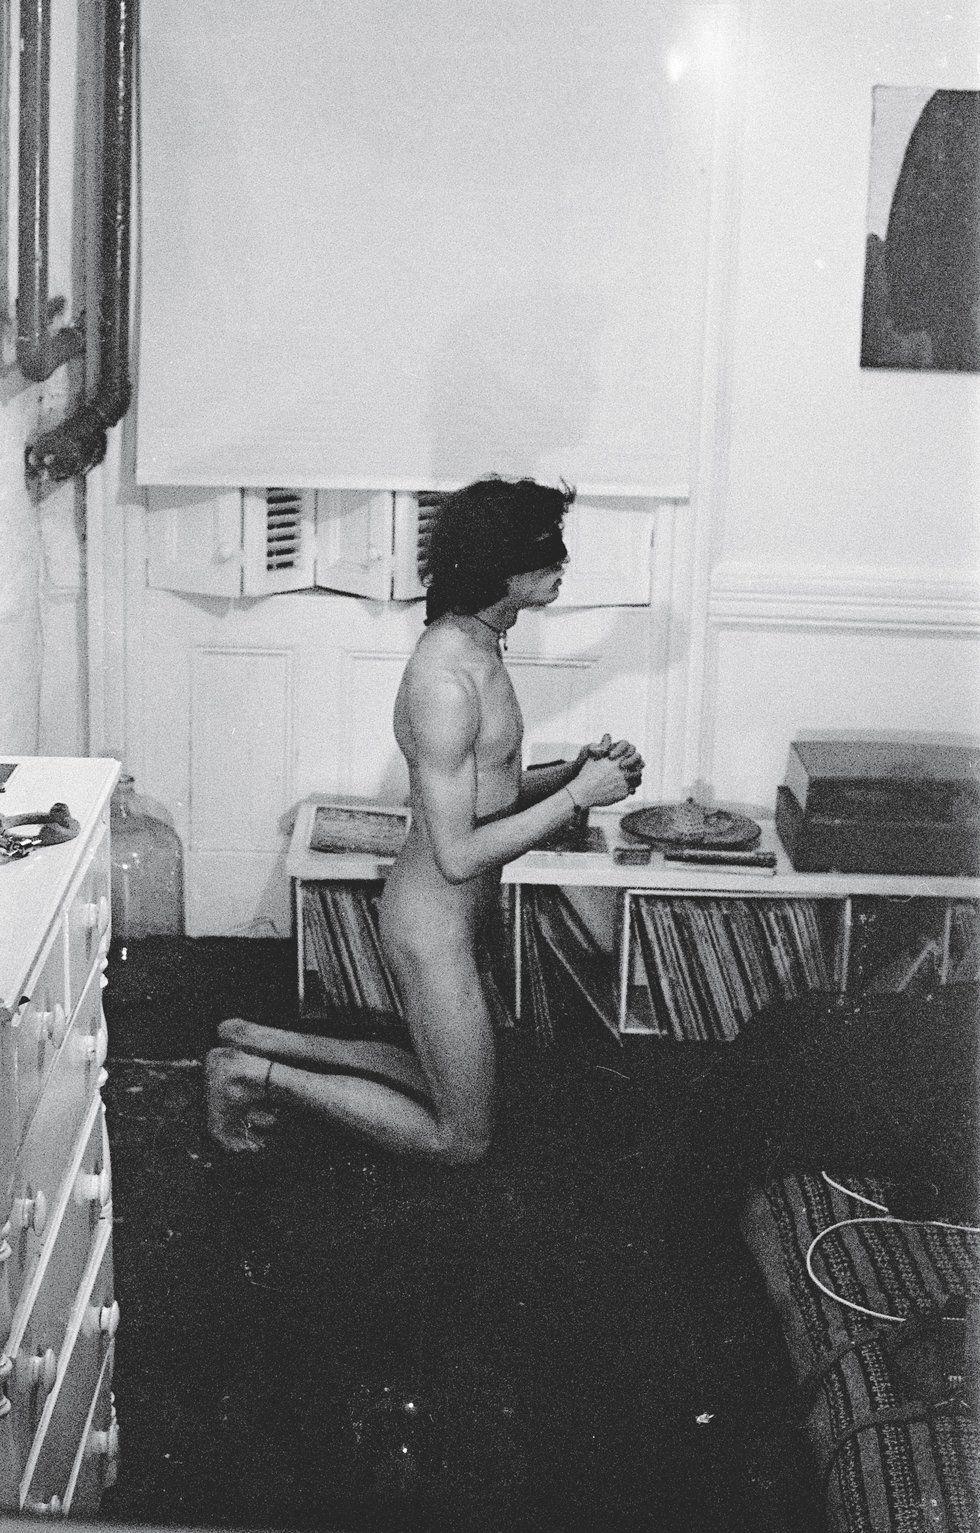 Conoce a Lloyd Ziff, el artista que fotografió a Patti Smith y a Robert Mapplethorpe desnudos